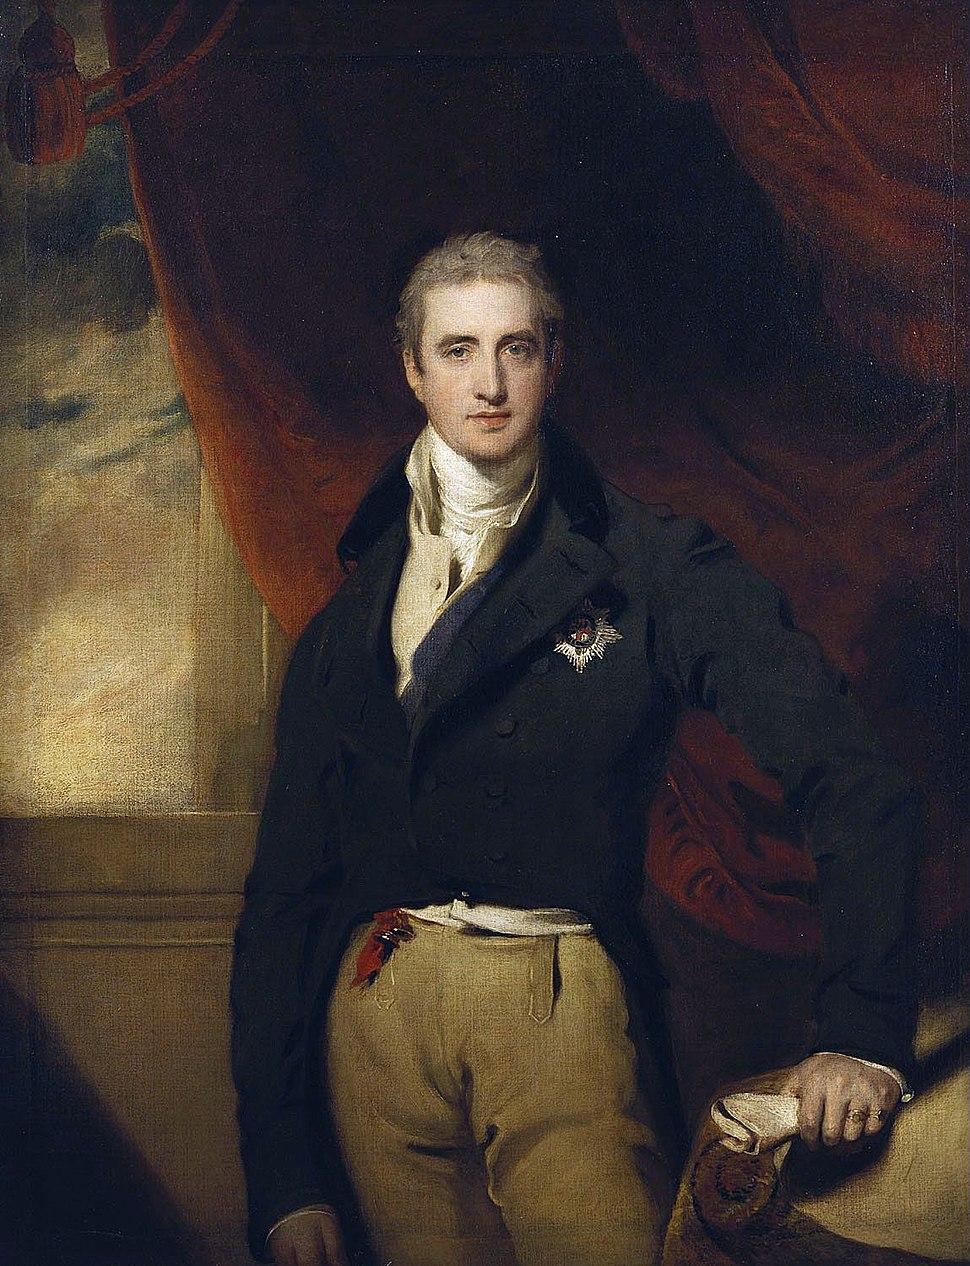 Robert Stewart - Lawrence 1817